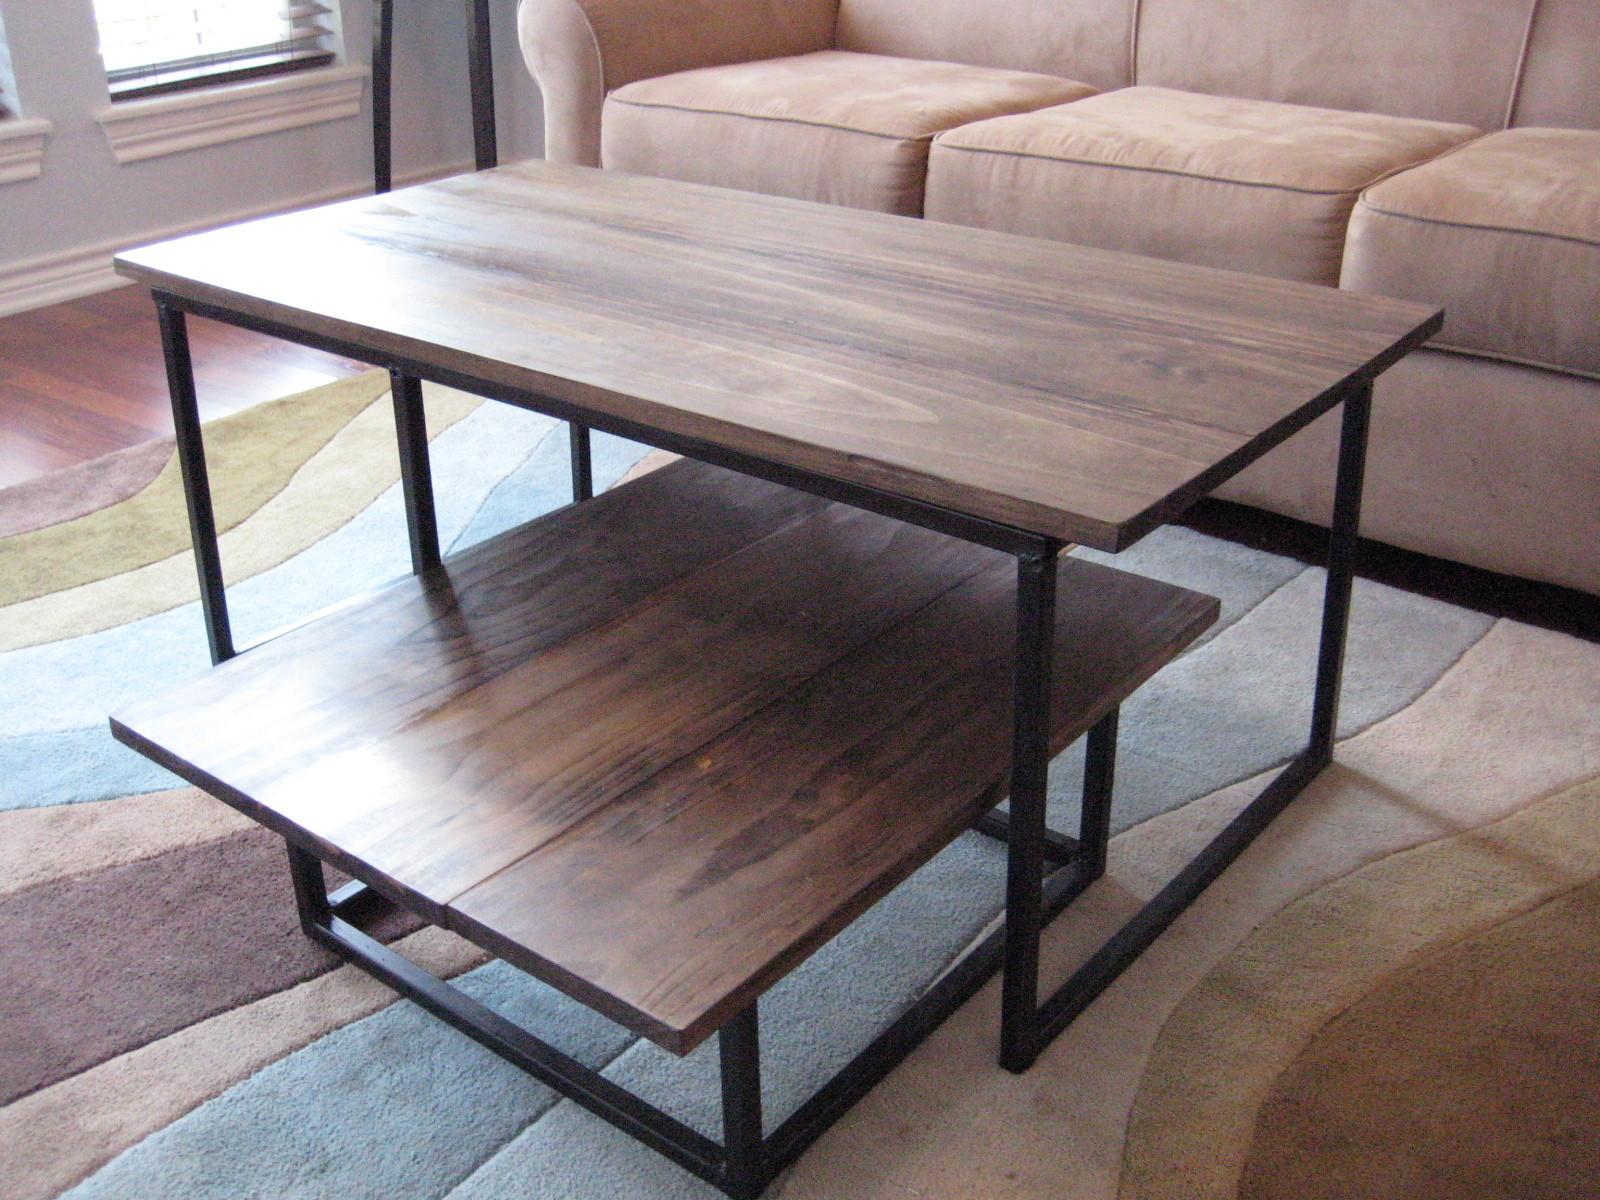 DIY Coffee Tables Plans  DIY Coffee Table